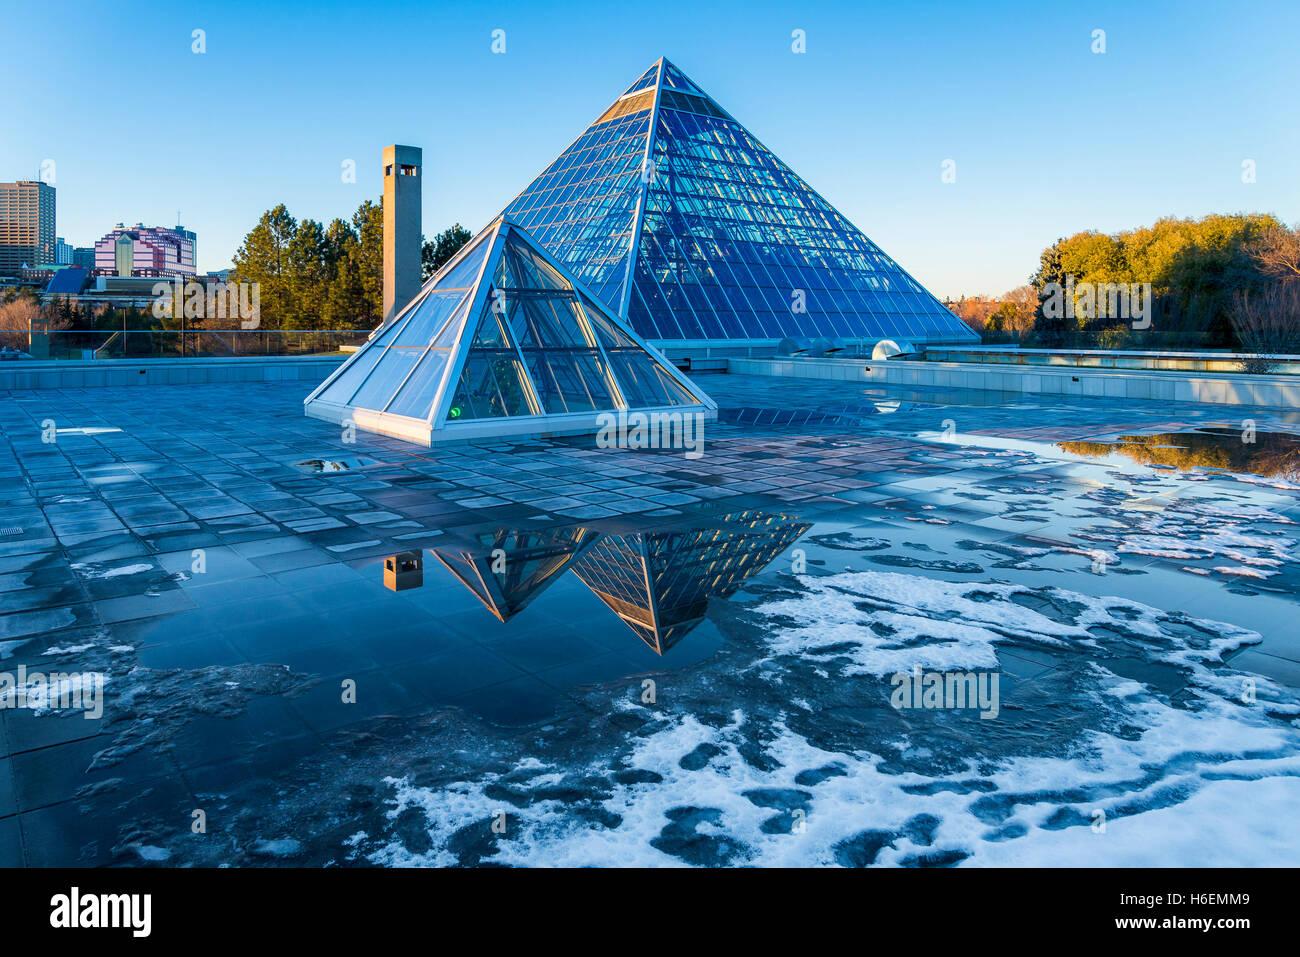 Conservatorio Muttart pirámides, un jardín botánico en Edmonton, Alberta, Canadá Imagen De Stock